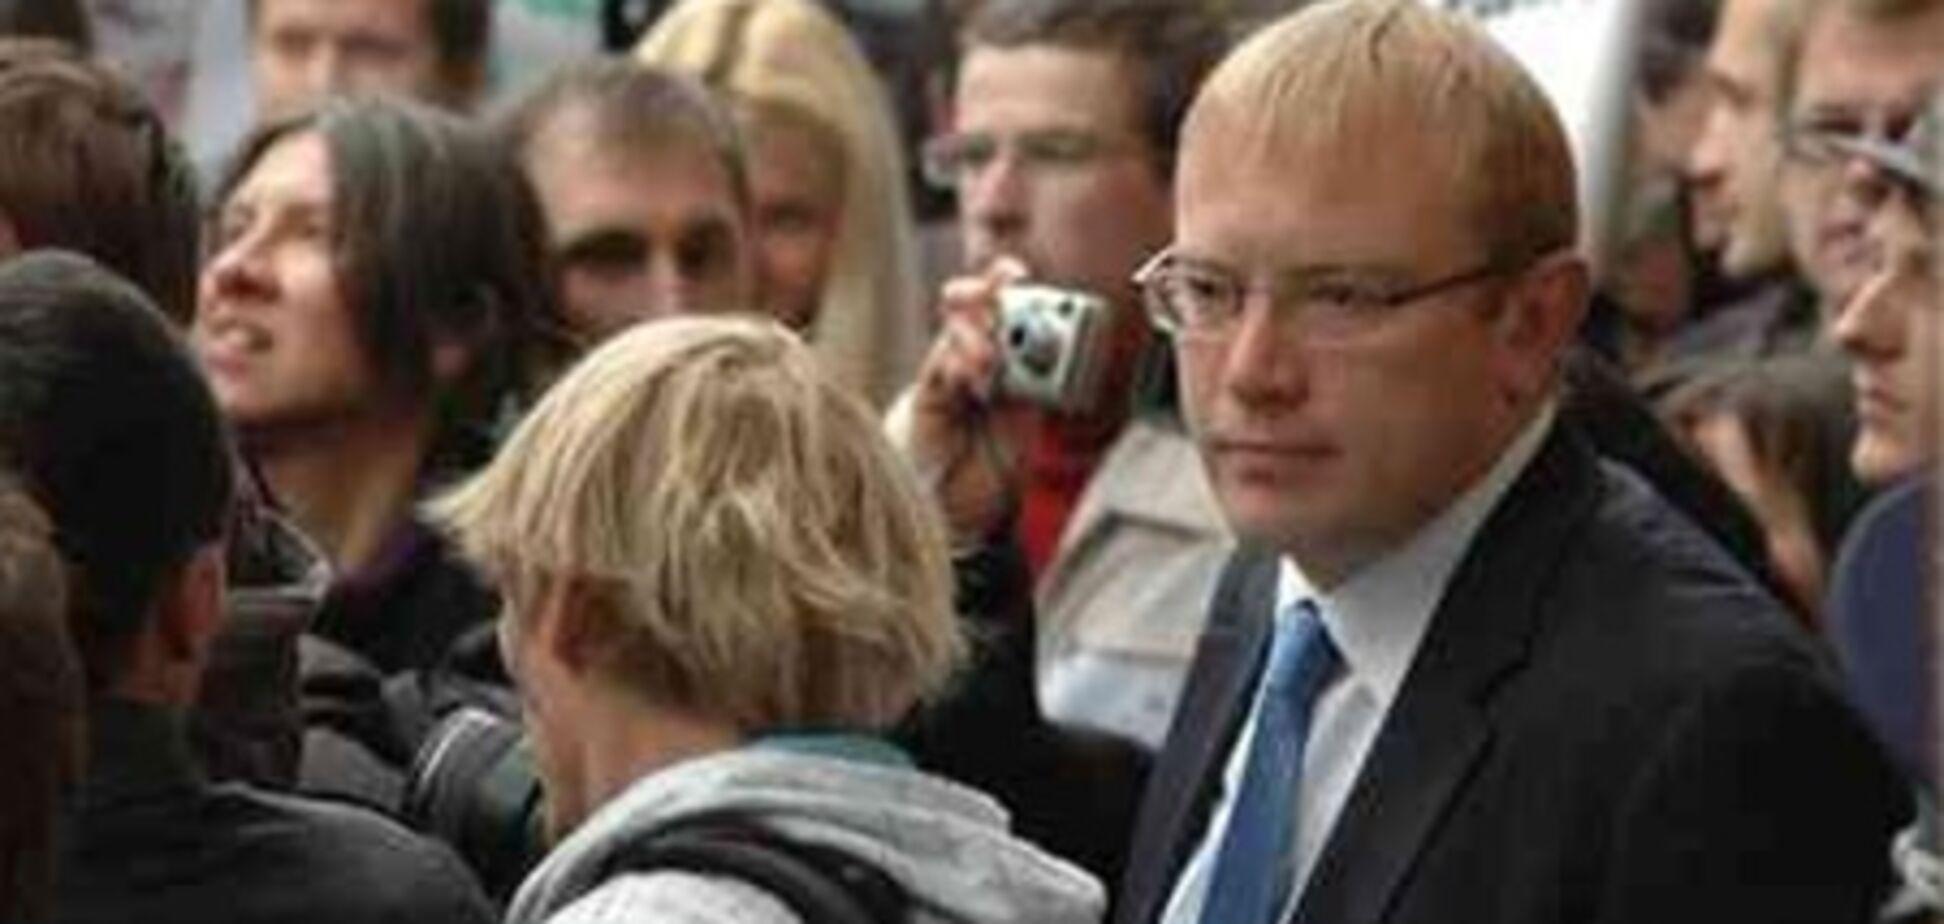 Нардеп Шевченко: «Мы блокируем трибуну до утра!»